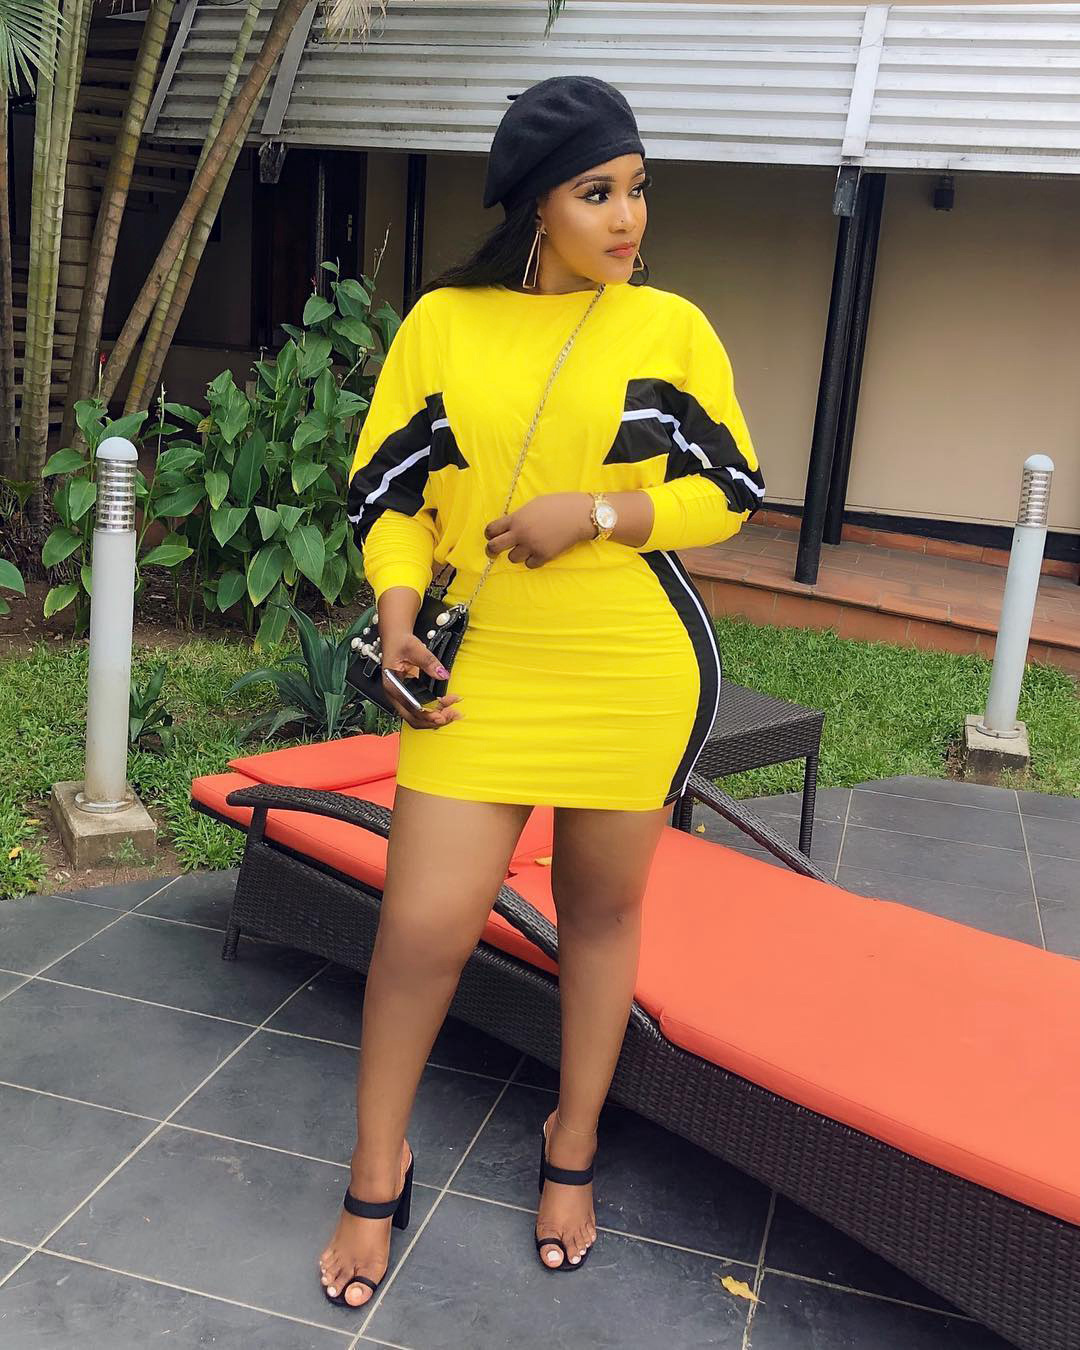 2020 women stripes splicing o-neck bat wing long sleeve mini midi skirts suit 2 pieces set fashion active wear bodycon dress